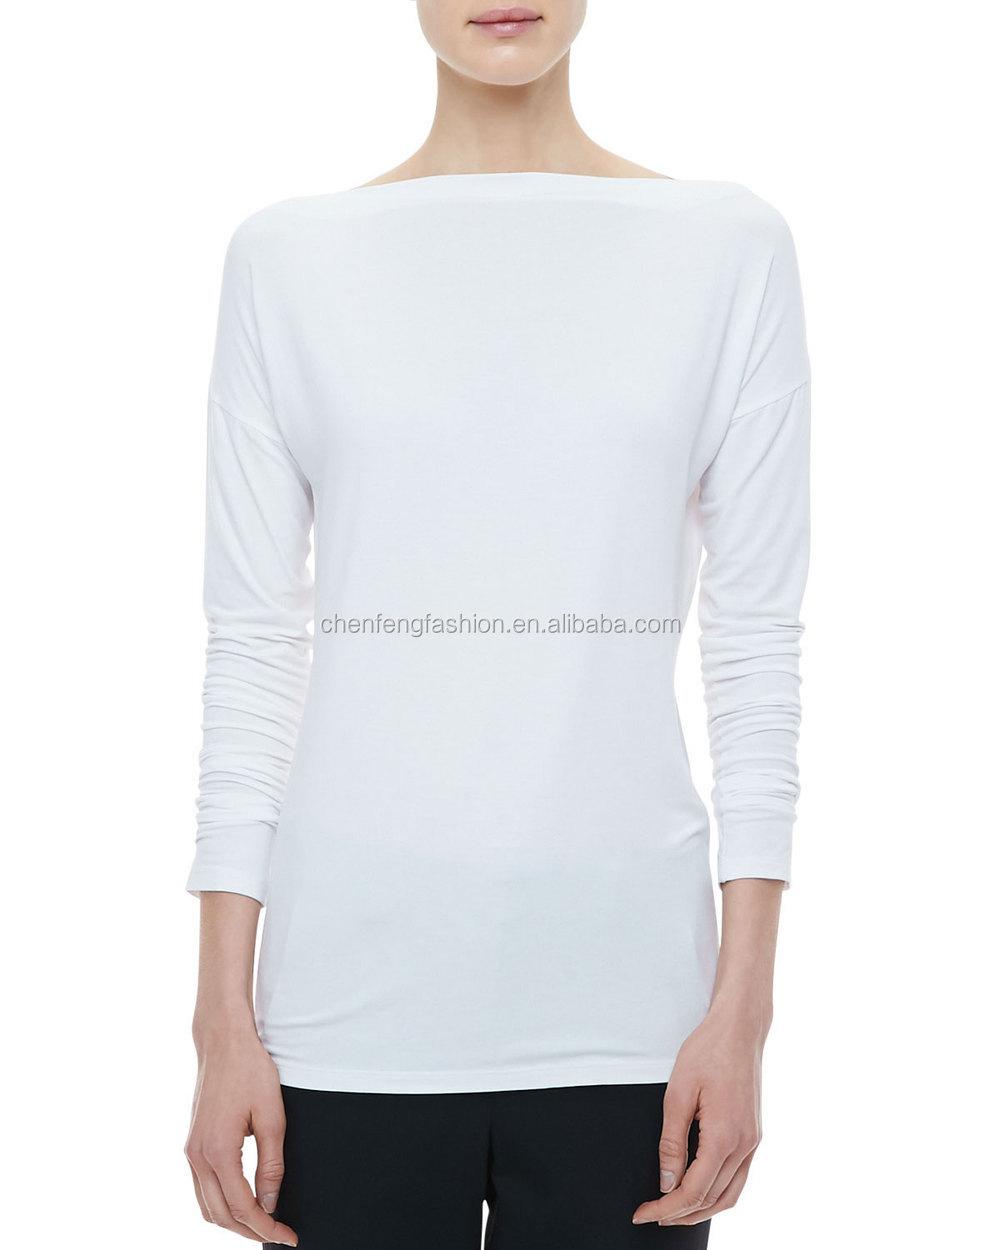 trends boat neckline shirt